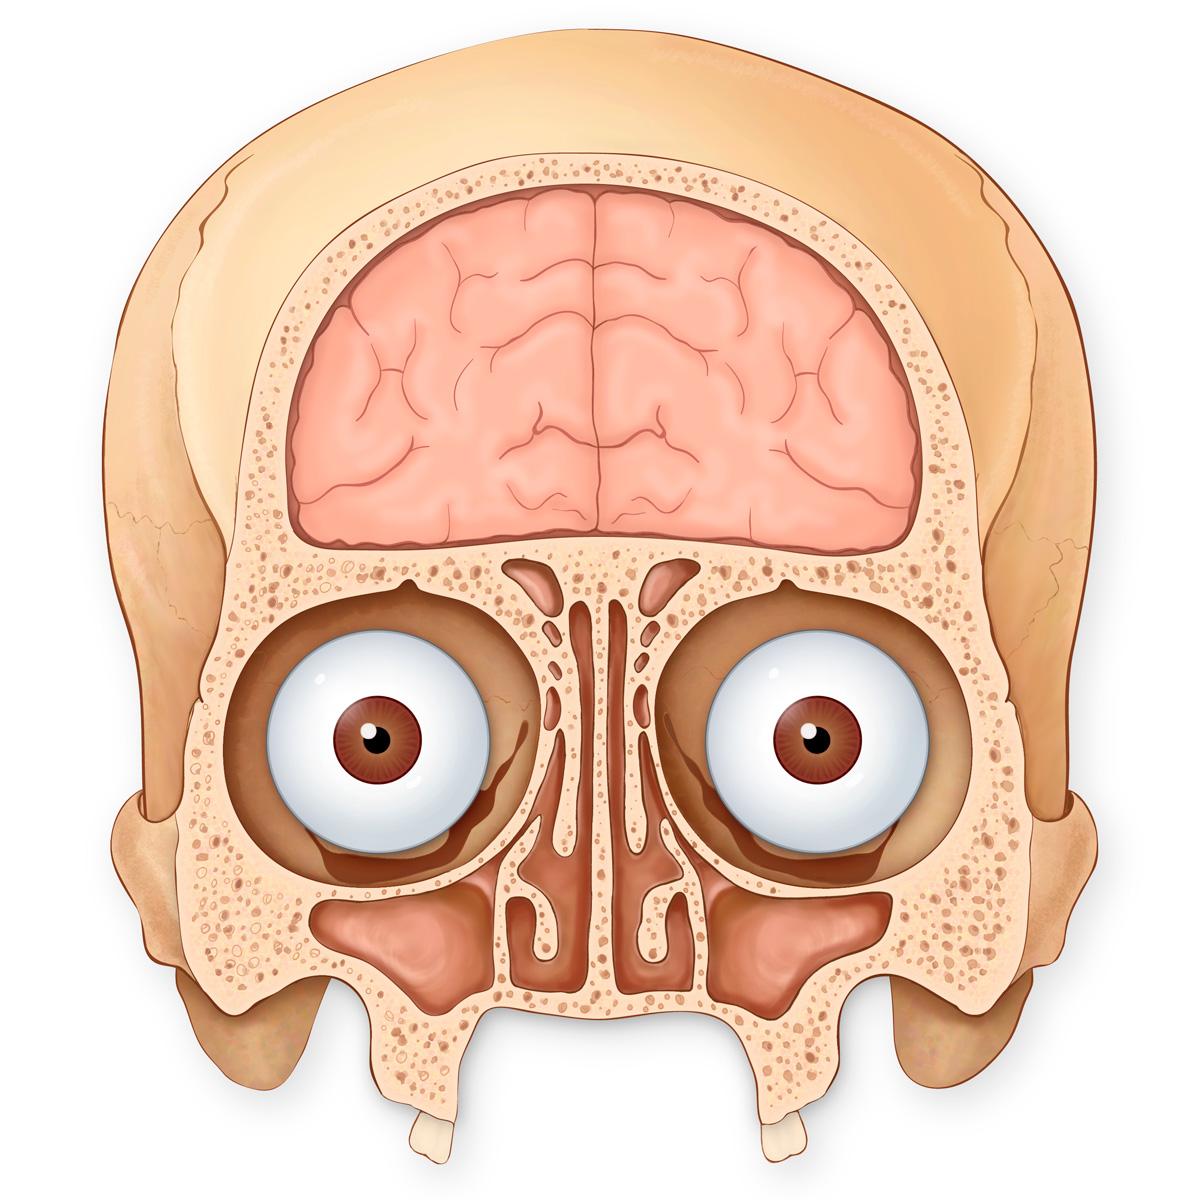 Medical Stock Art, Pediatric Skull, Brain, Eyes and Sinuses